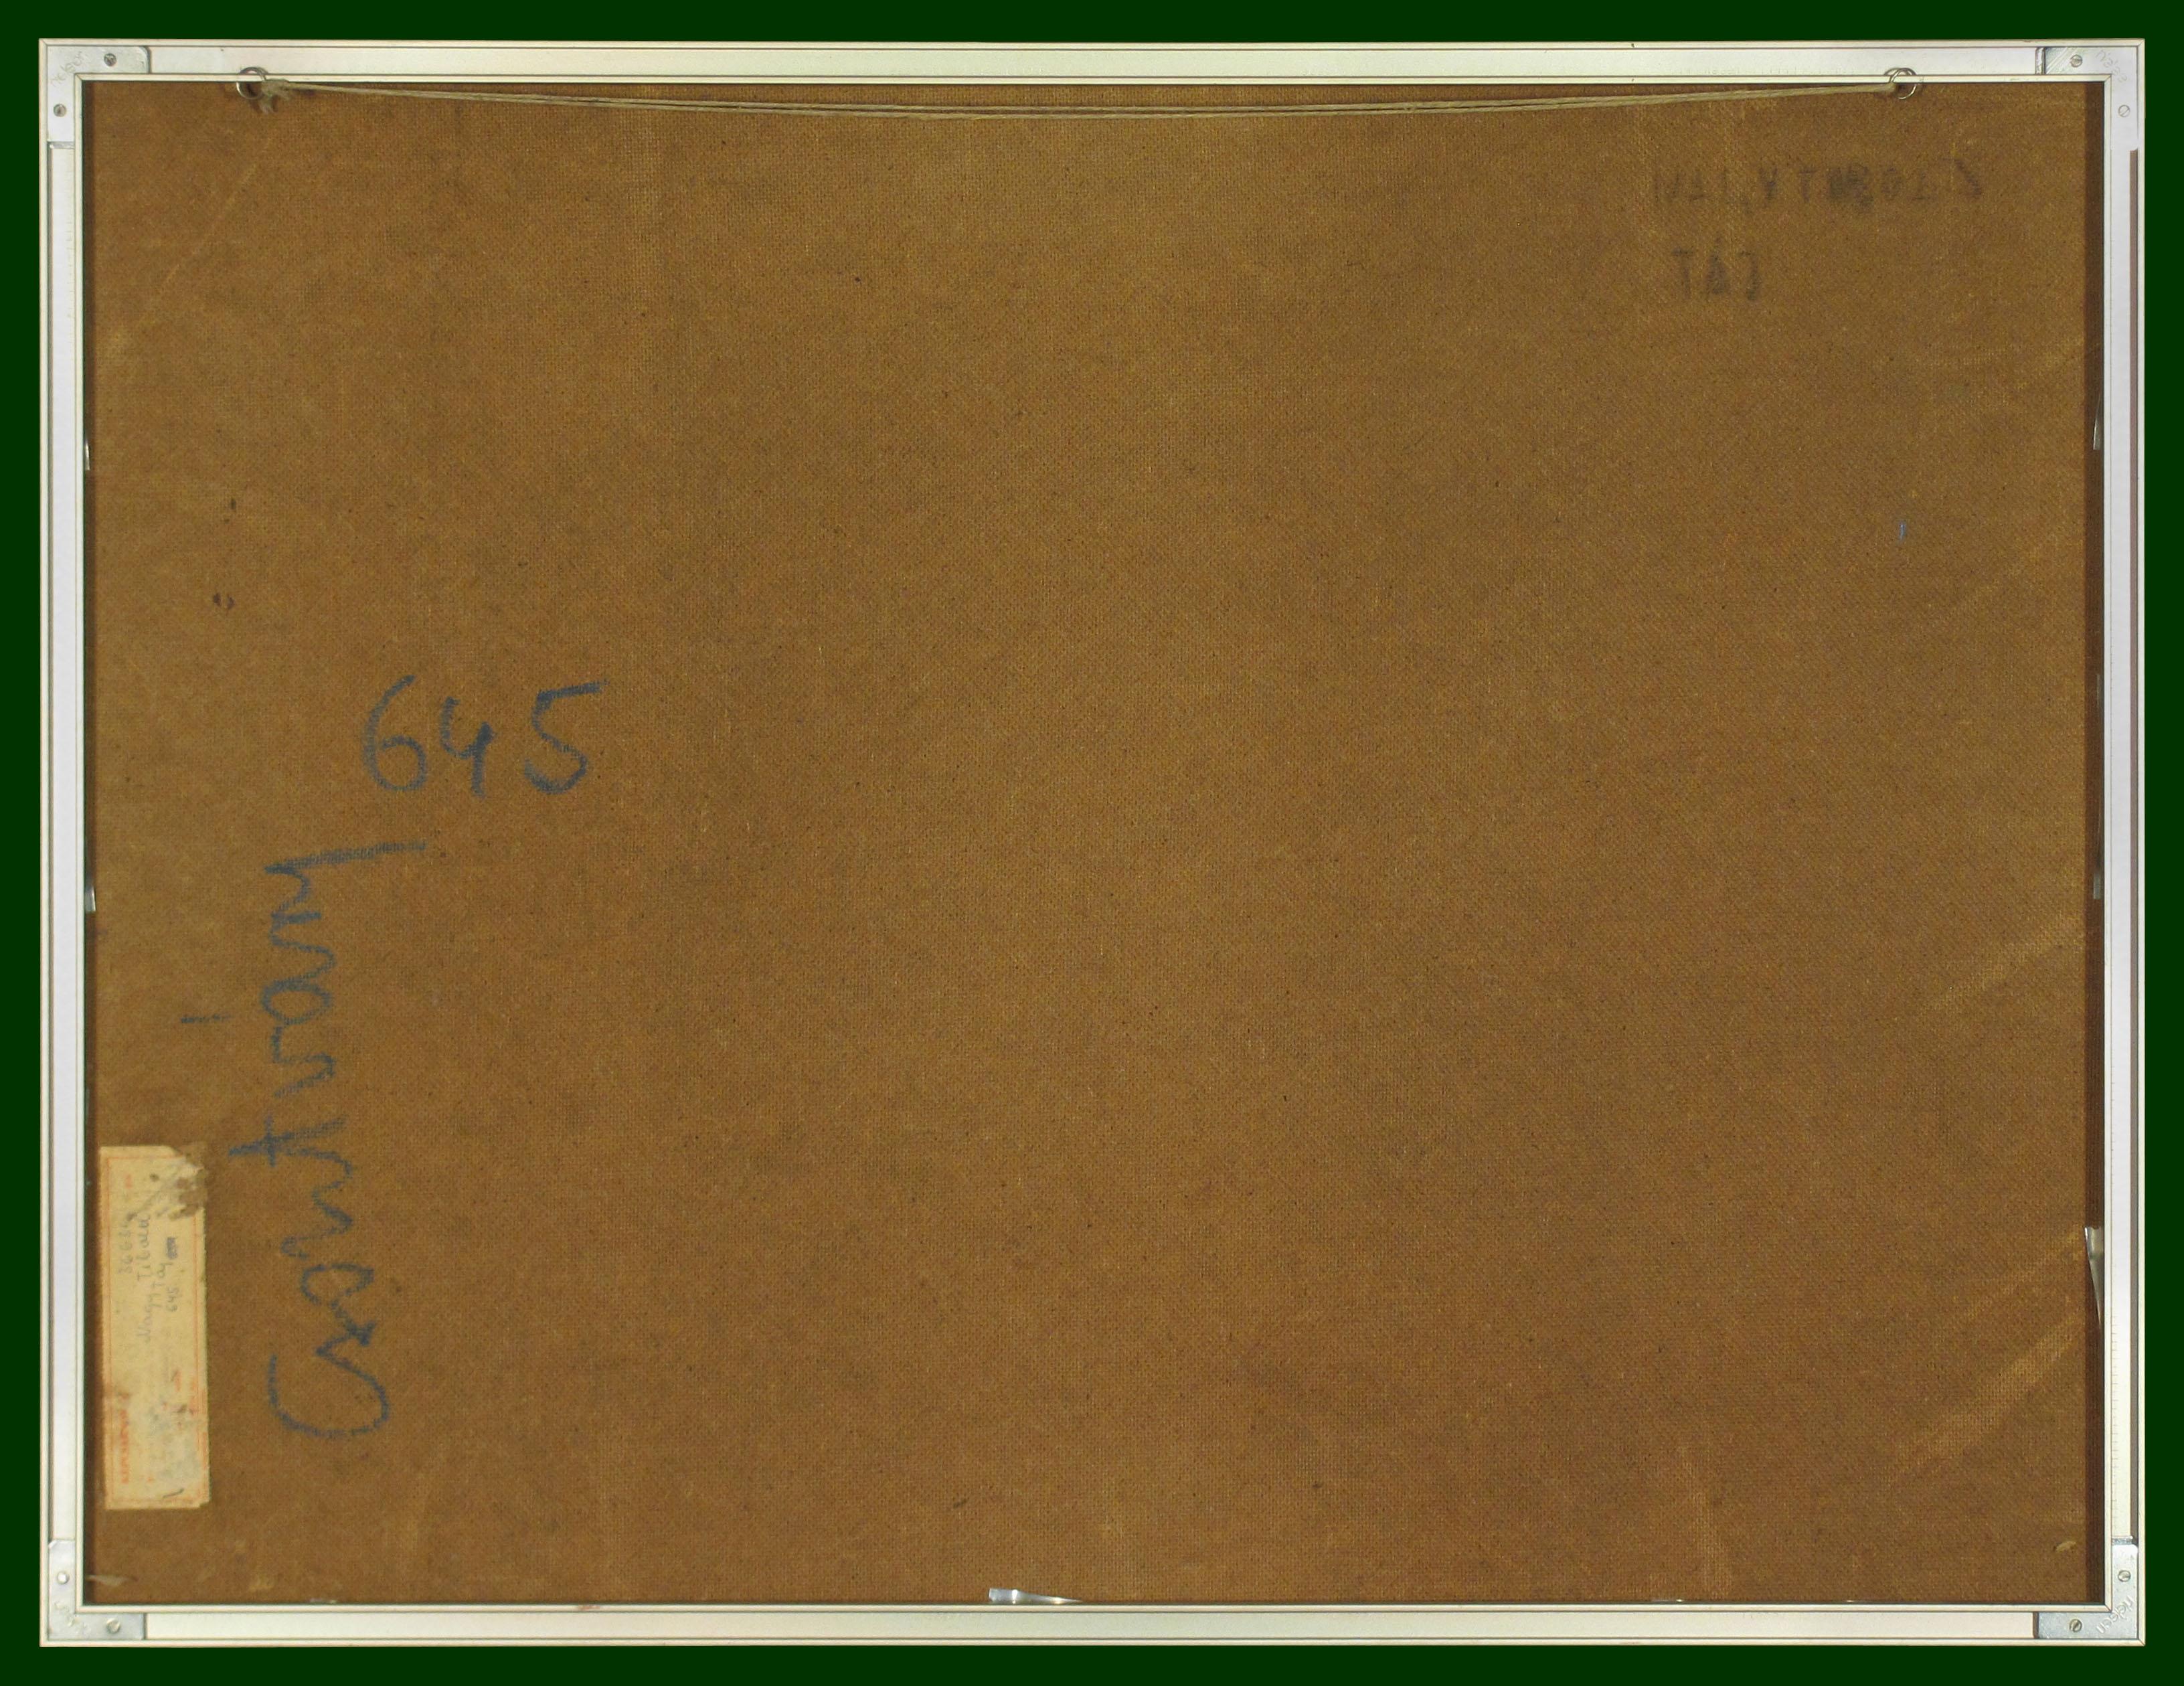 6-19hát.jpg (3263×2519)